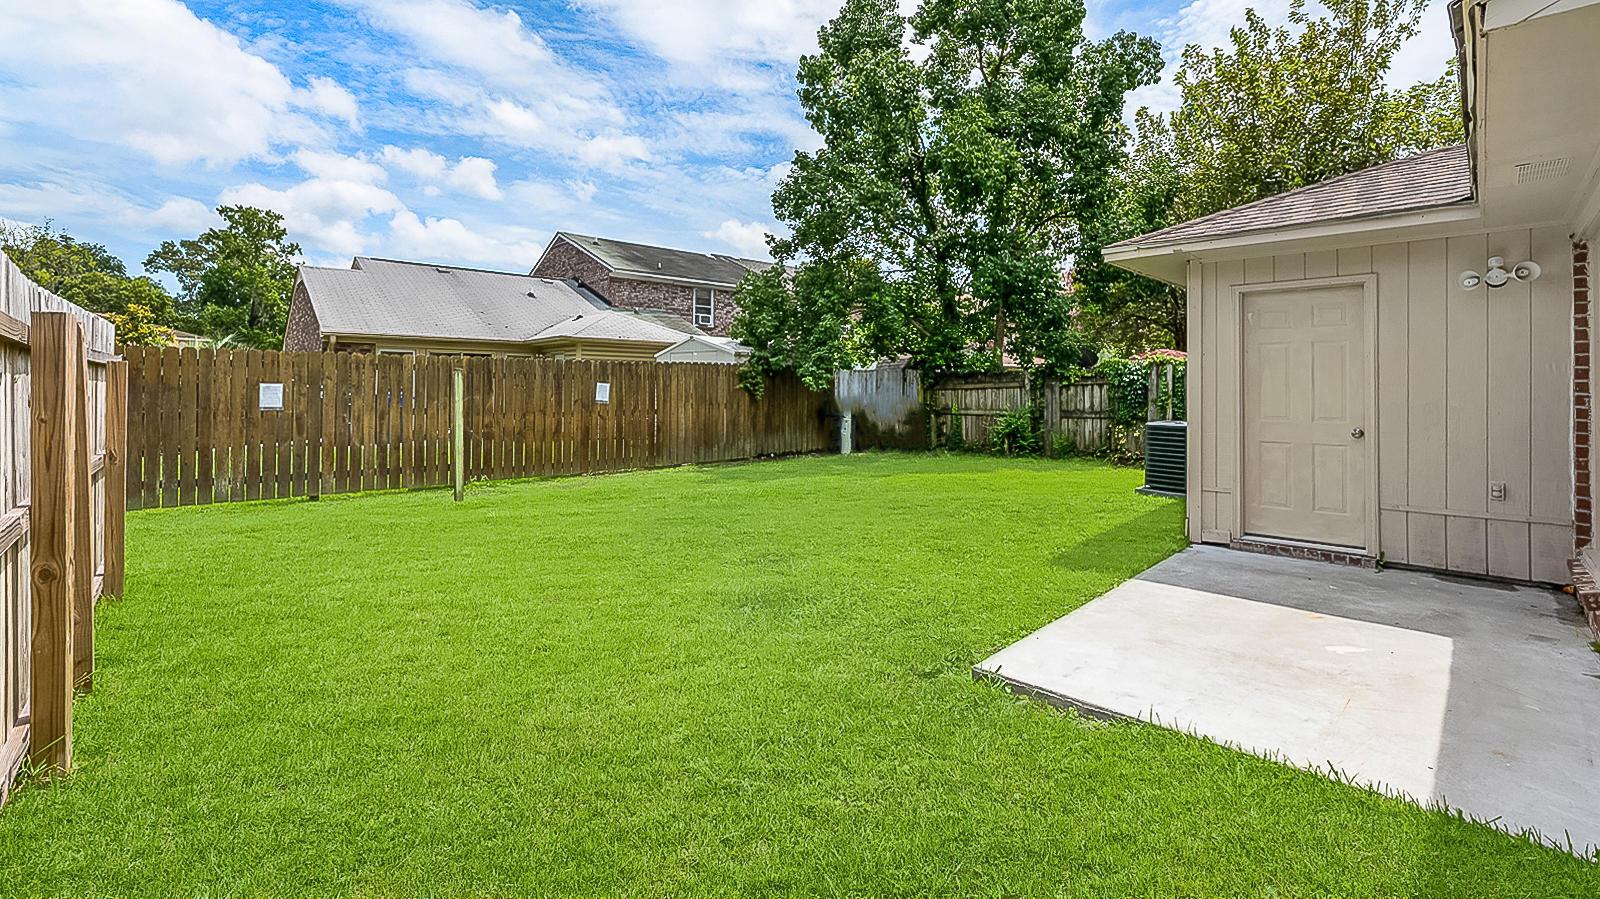 Ashley Villas Homes For Sale - 4315 Briarstone, North Charleston, SC - 33